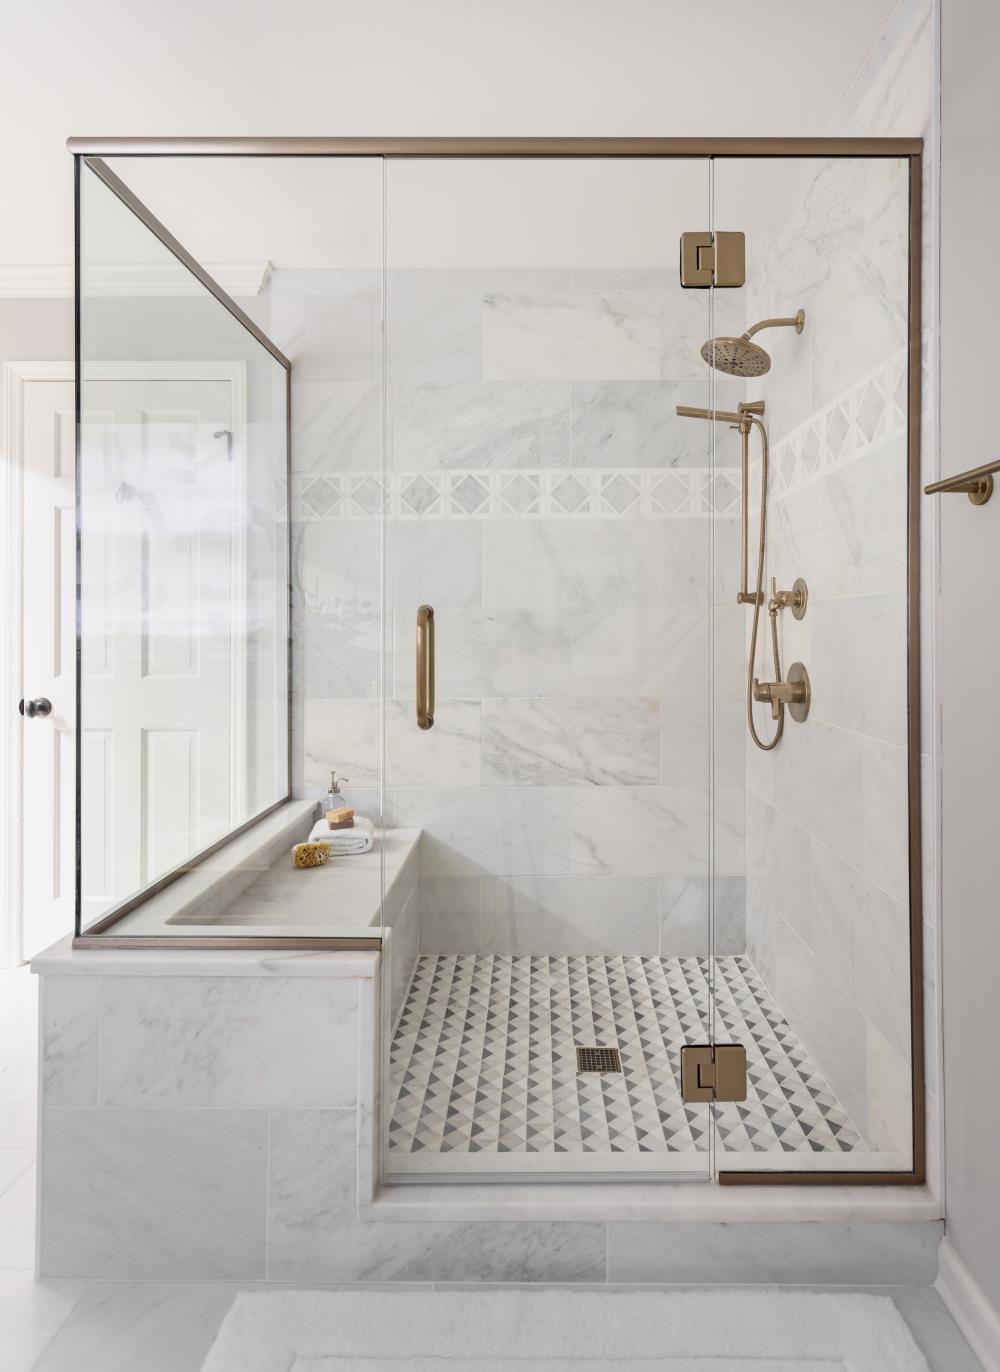 Interior-design-arkansas-bathroom-refresh-Krista-Lewis-003